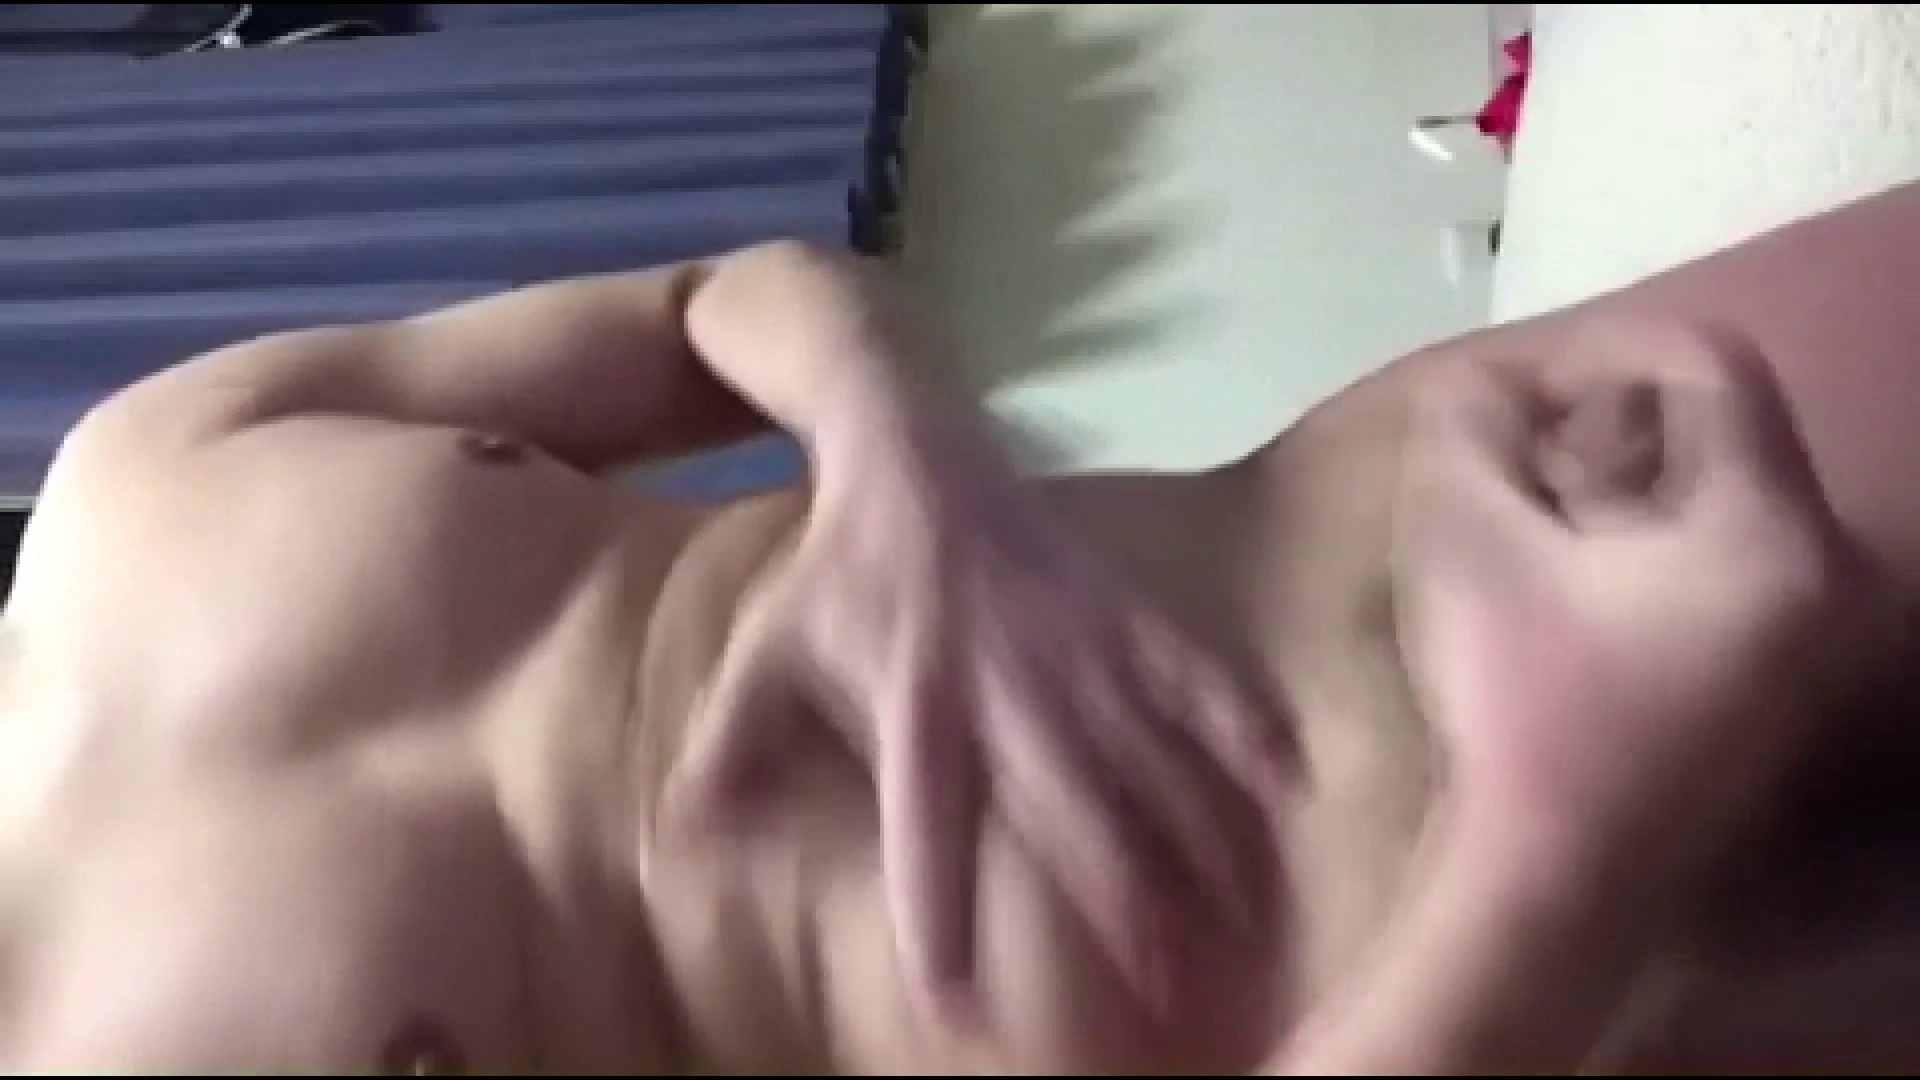 個人撮影 自慰の極意 Vol.17 手淫 AV動画 105枚 76